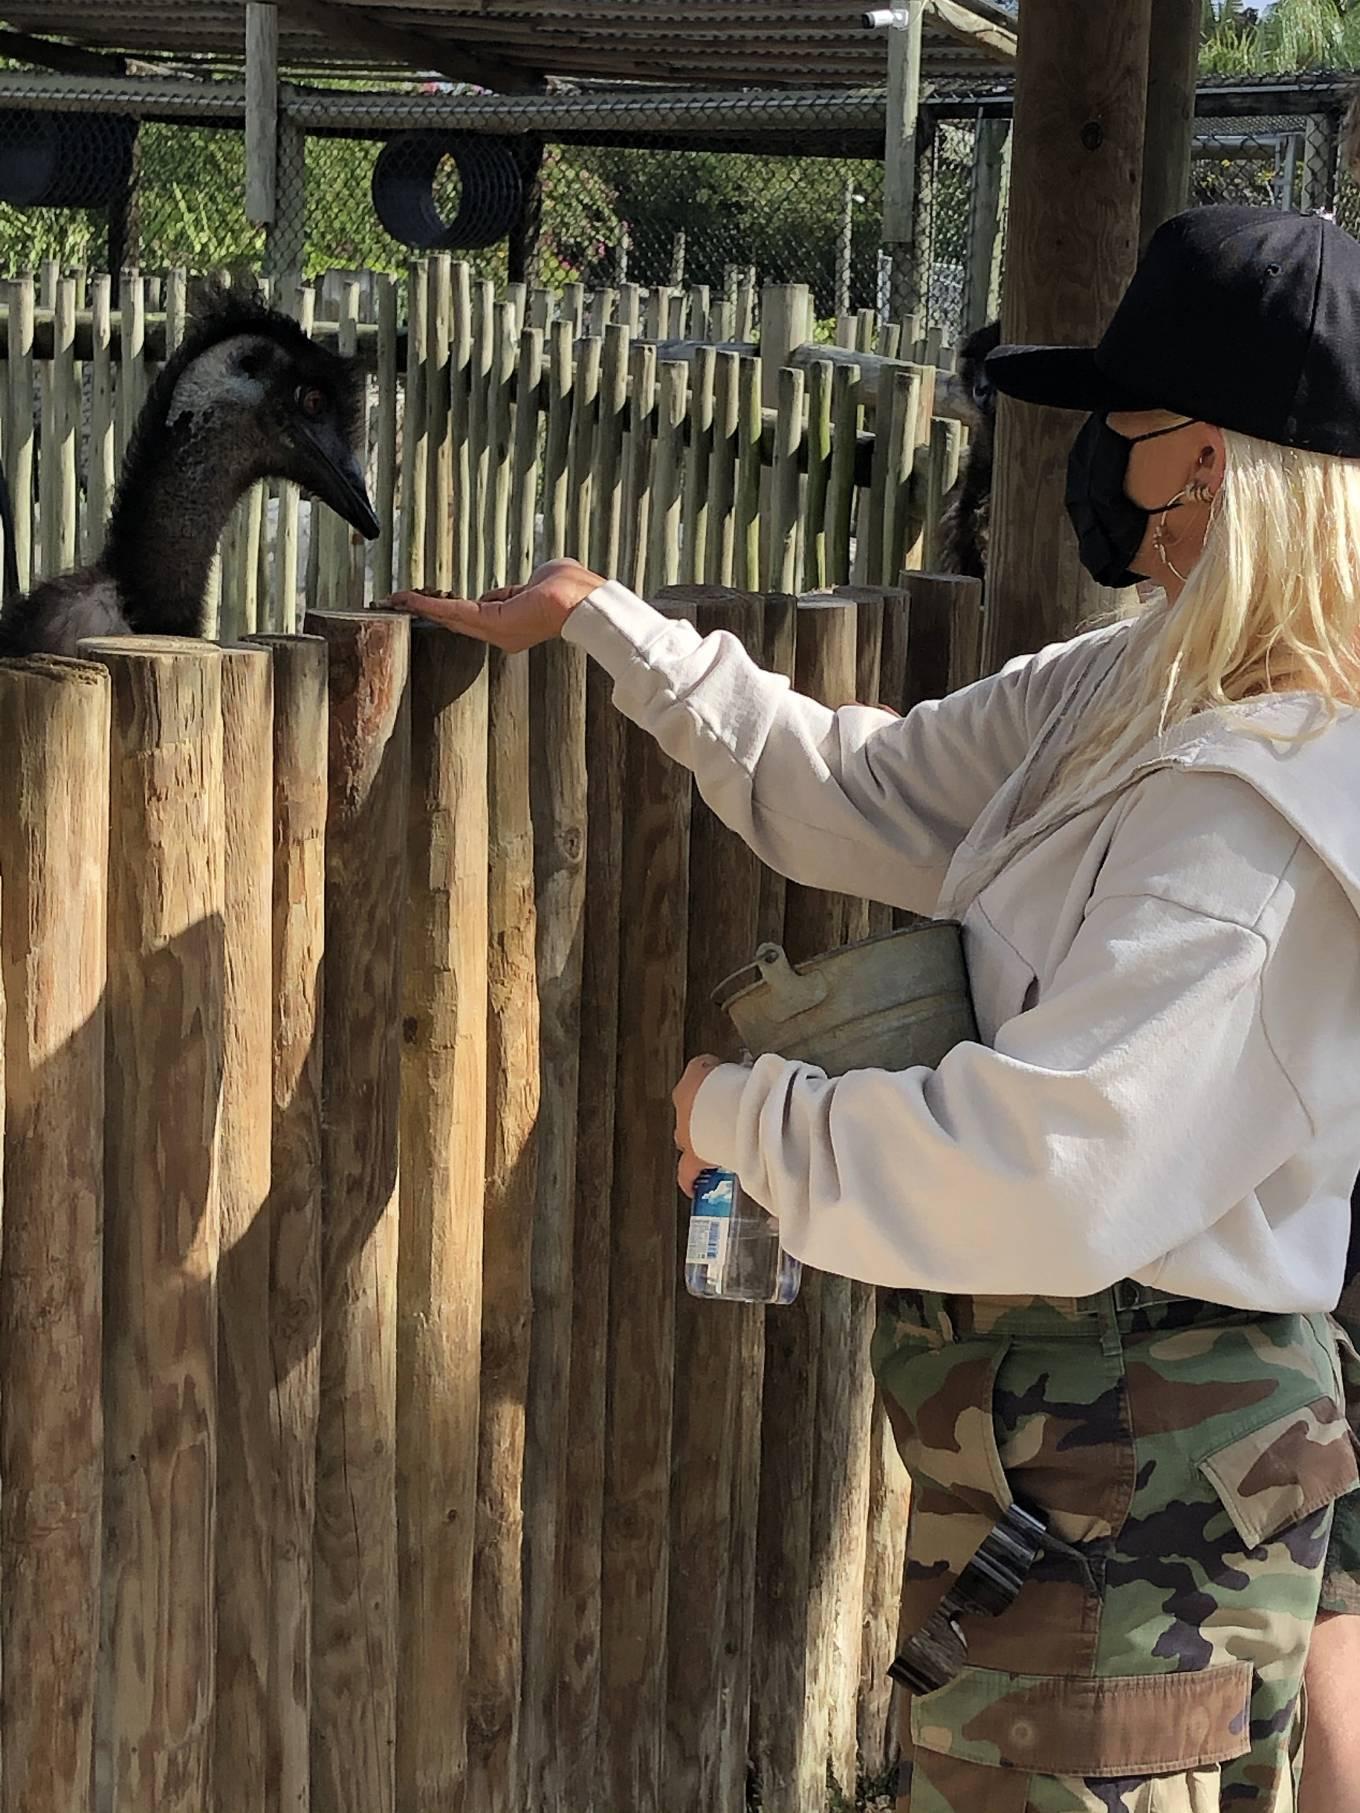 Christina Aguilera - With Matthew Rutler seen at Everglades Alligator Farm in Florida